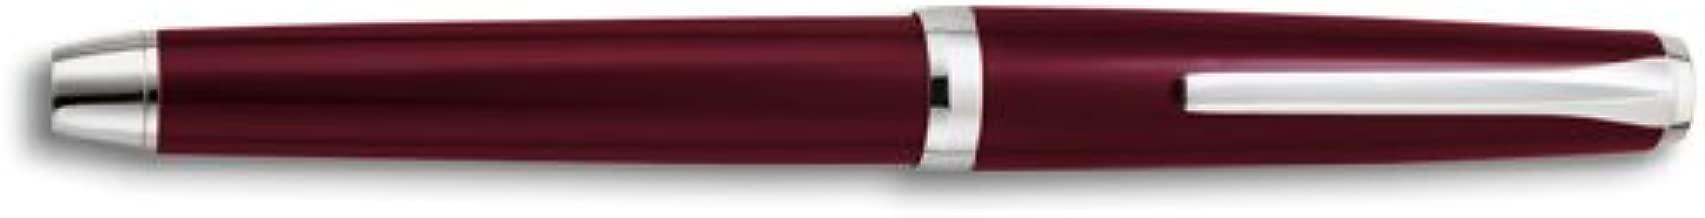 Pilot Metal Falcon Burgundy Soft Flexible Nib designed by Namiki Broad Point Fountain Pen - P60773